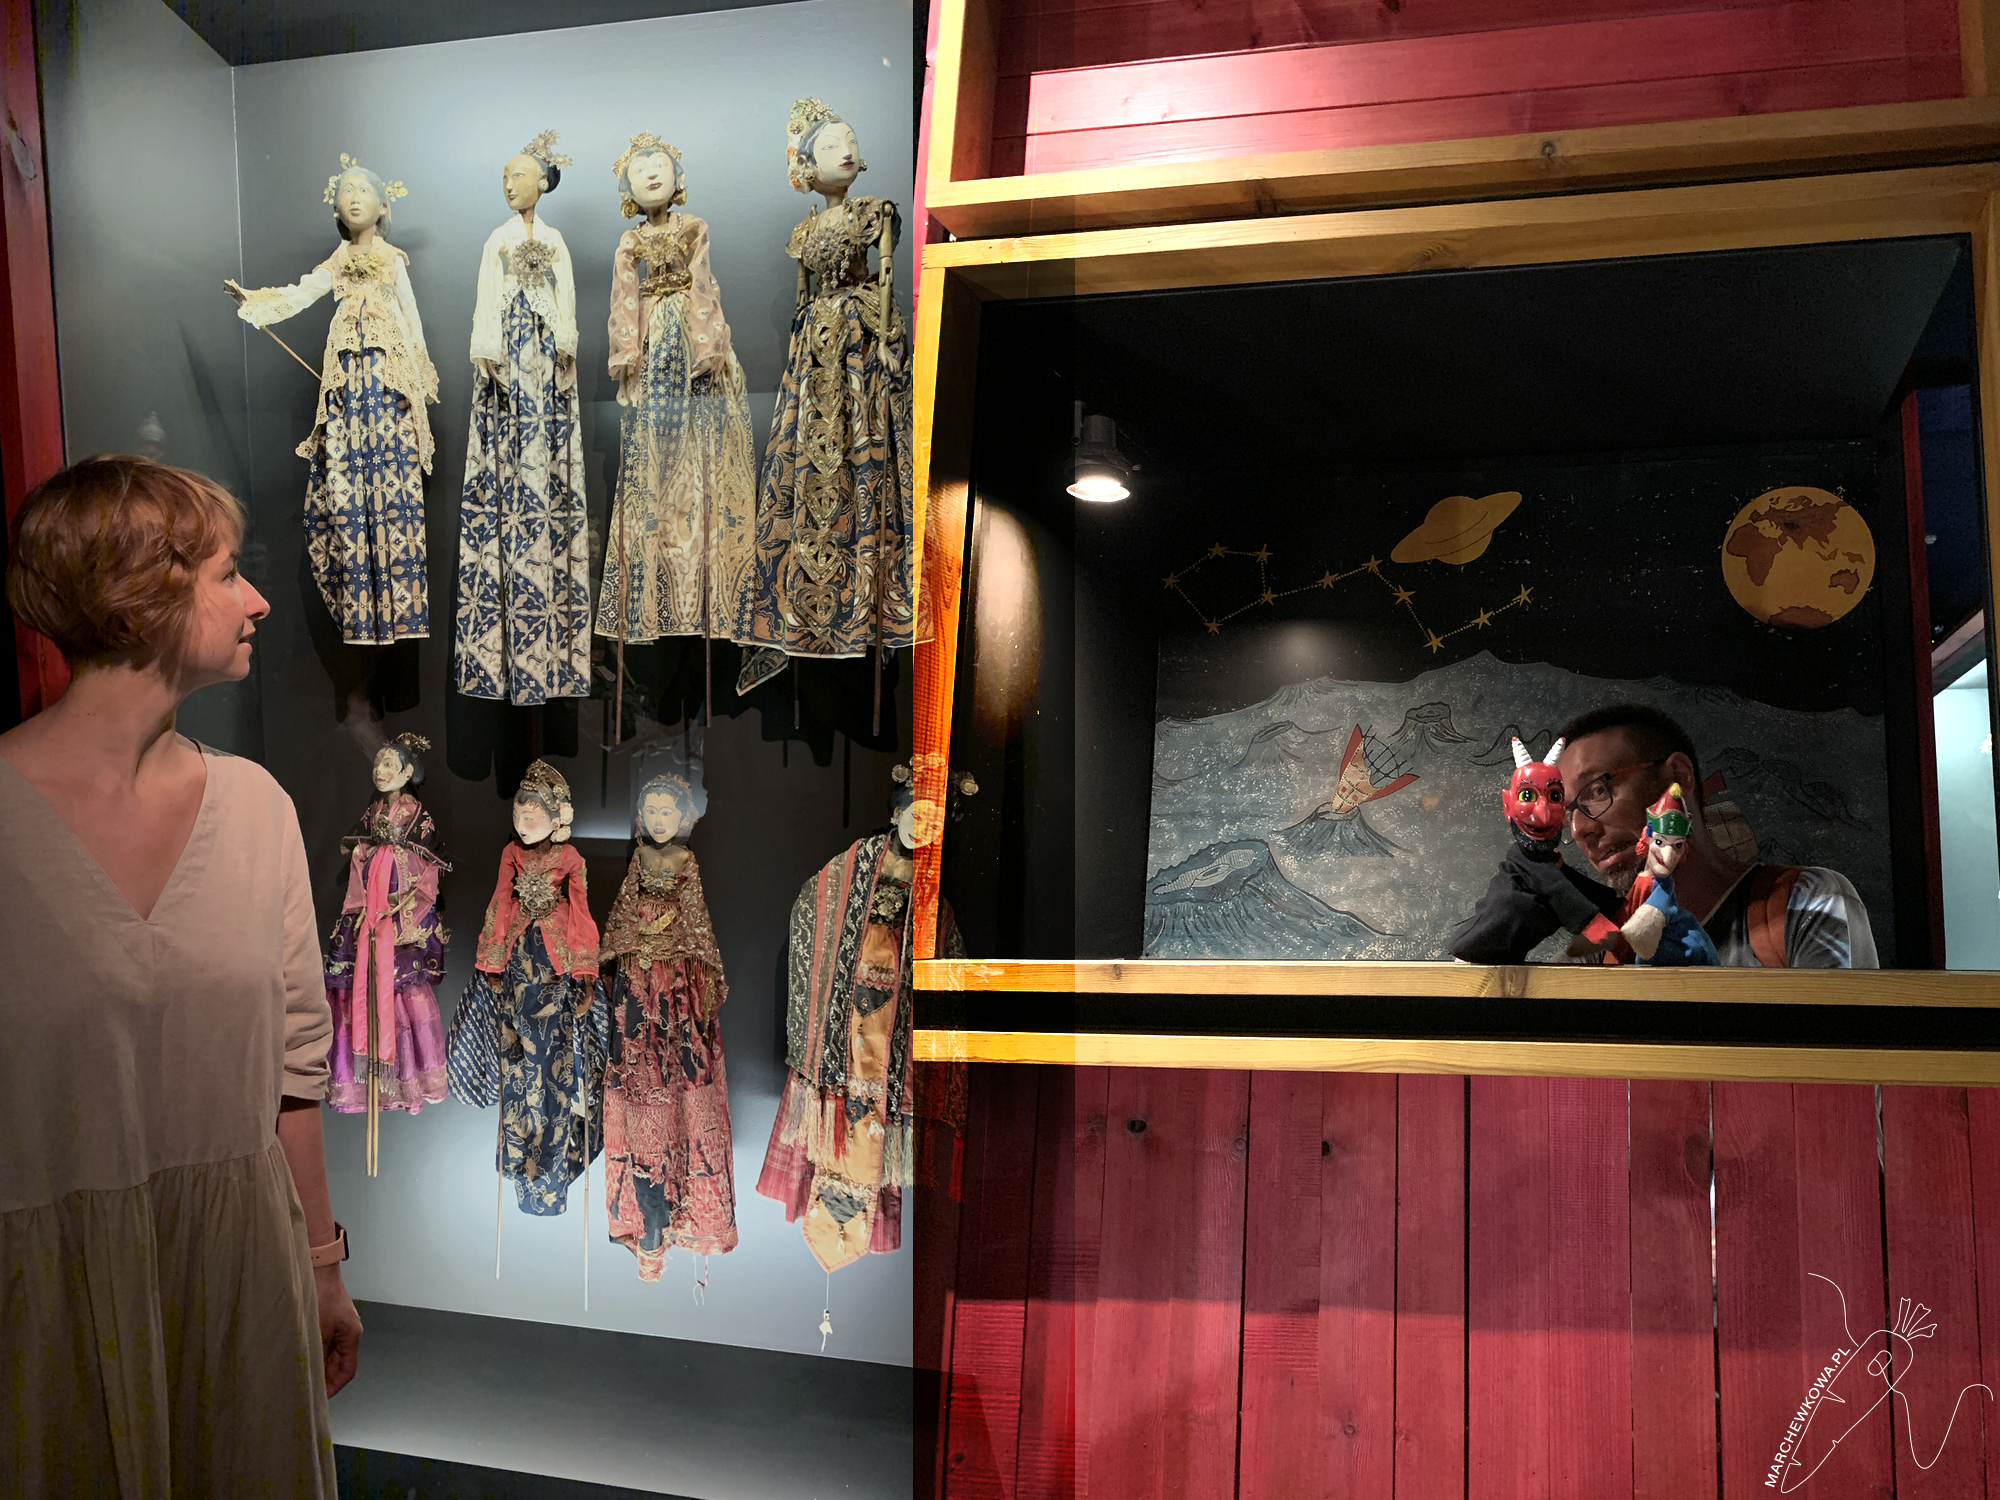 marchewkowa, blog, podróże, urlop, wakacje, Portugalia, Lizbona, Mouraria, fado, travel, Lisboa, Museu da Marioneta